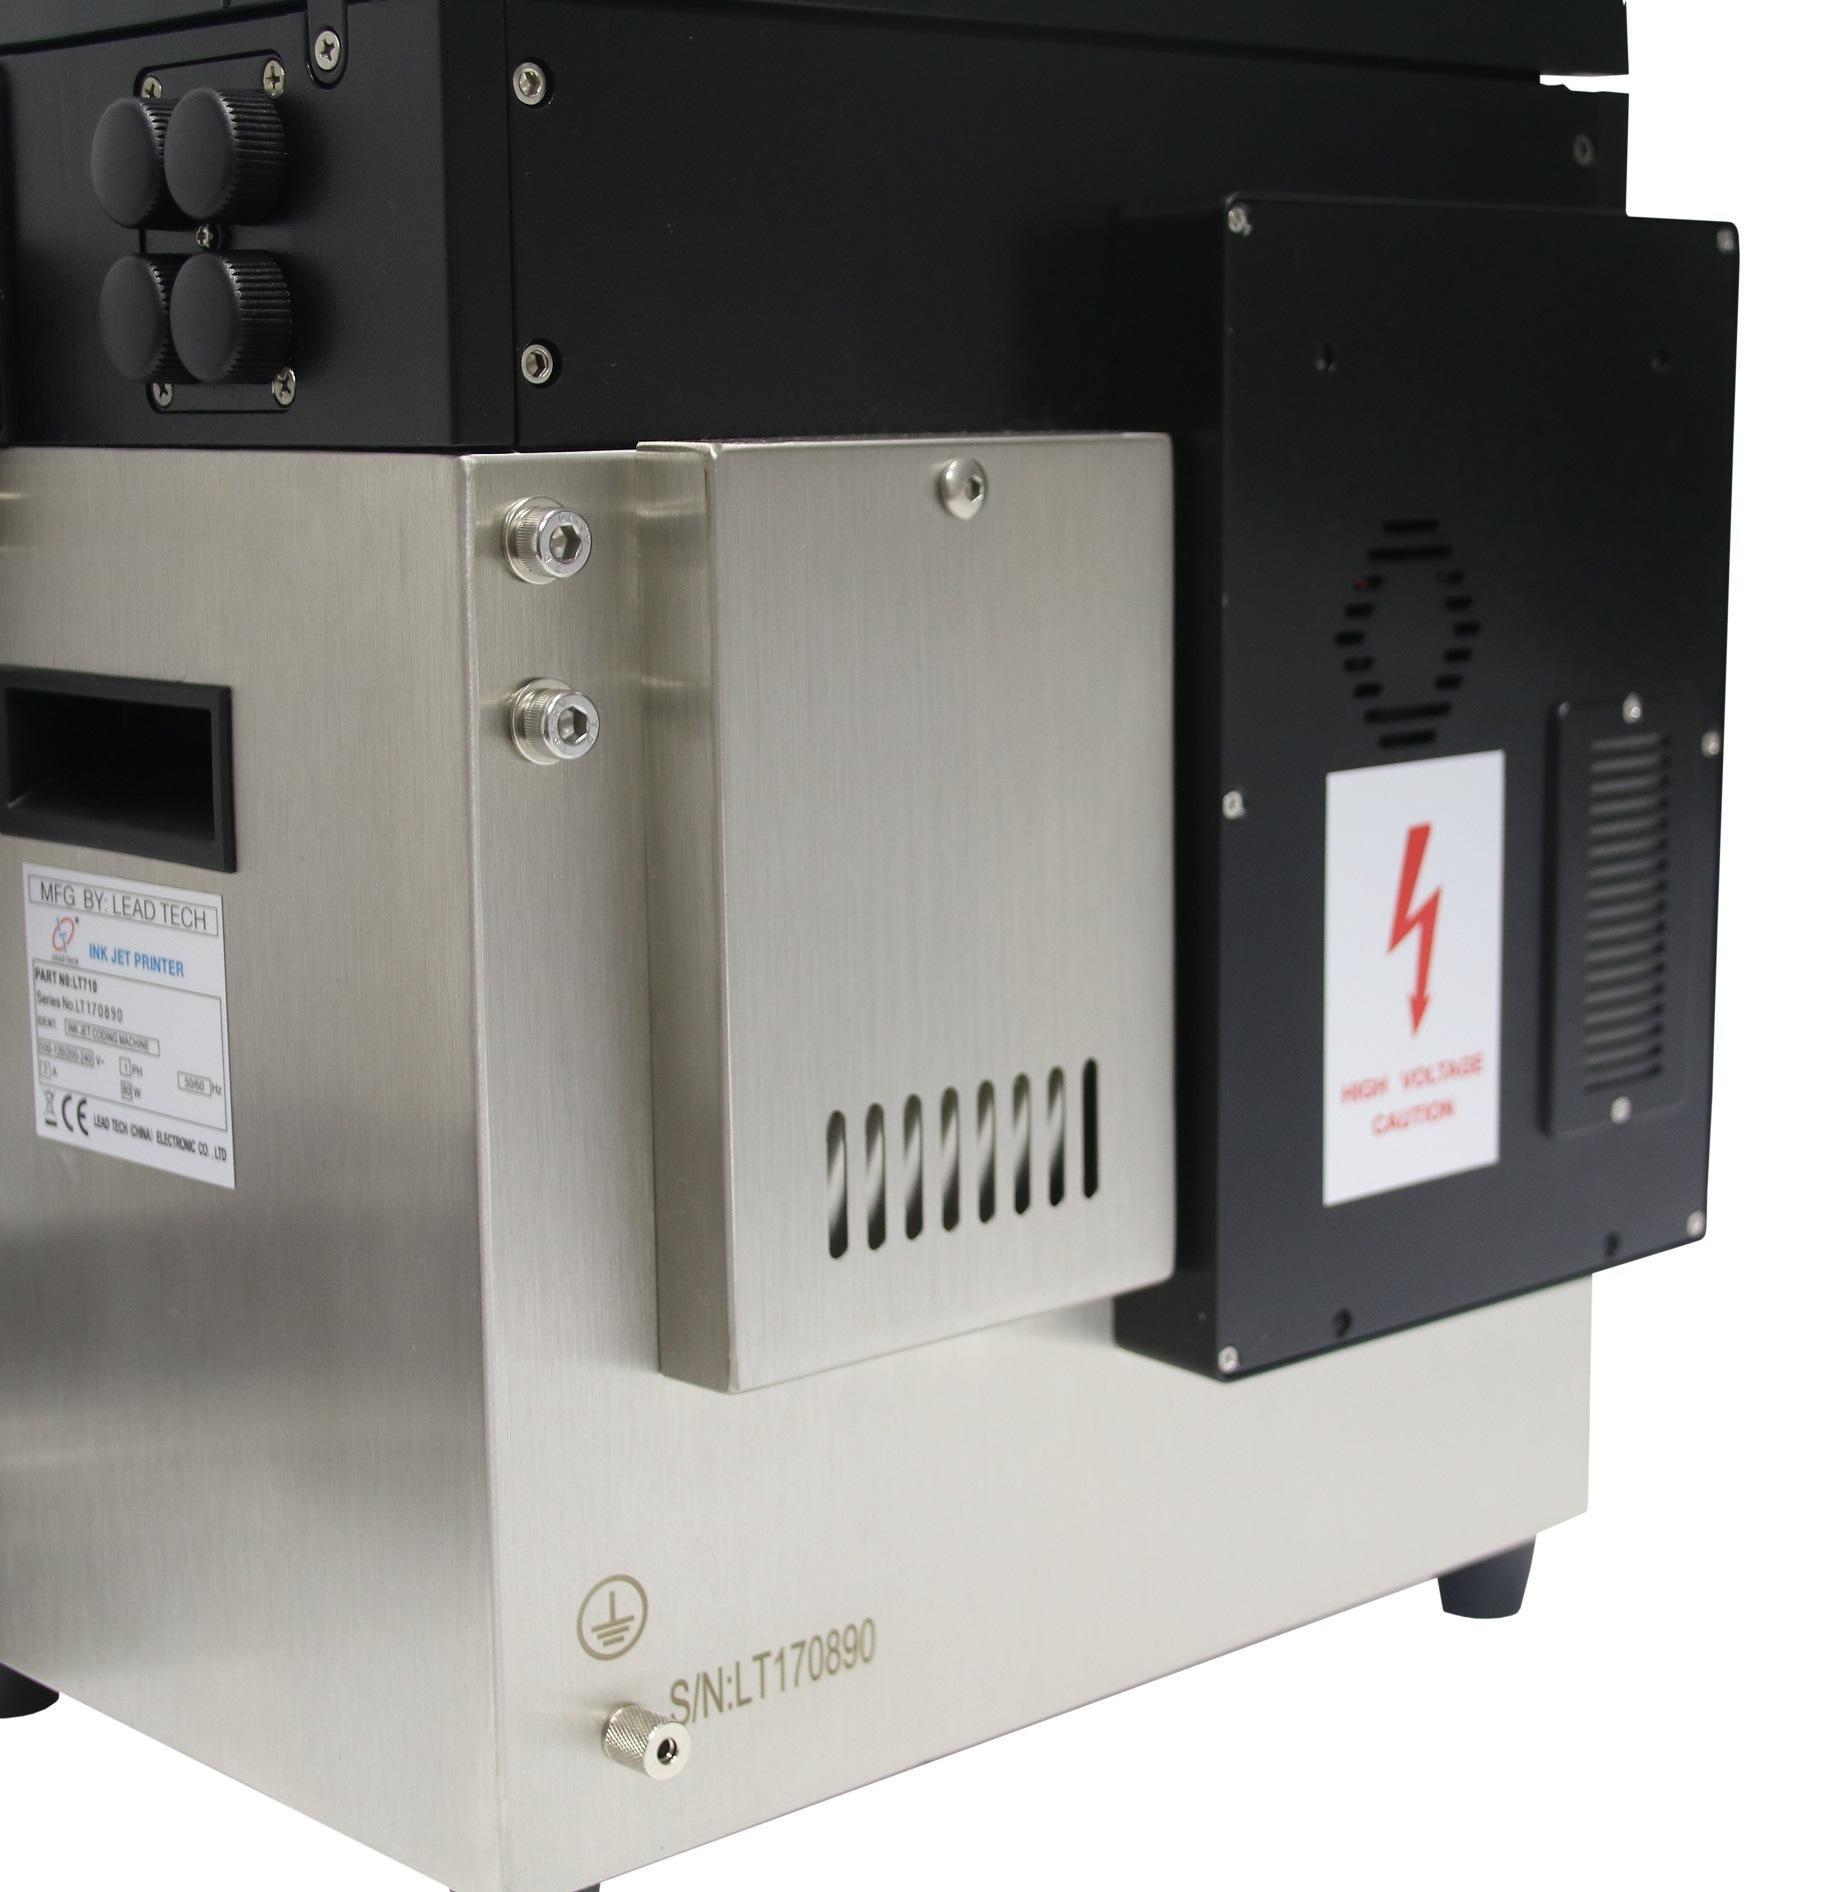 Lead Tech HDPE Coding Continuous Cij Inkjet Printer Lt760